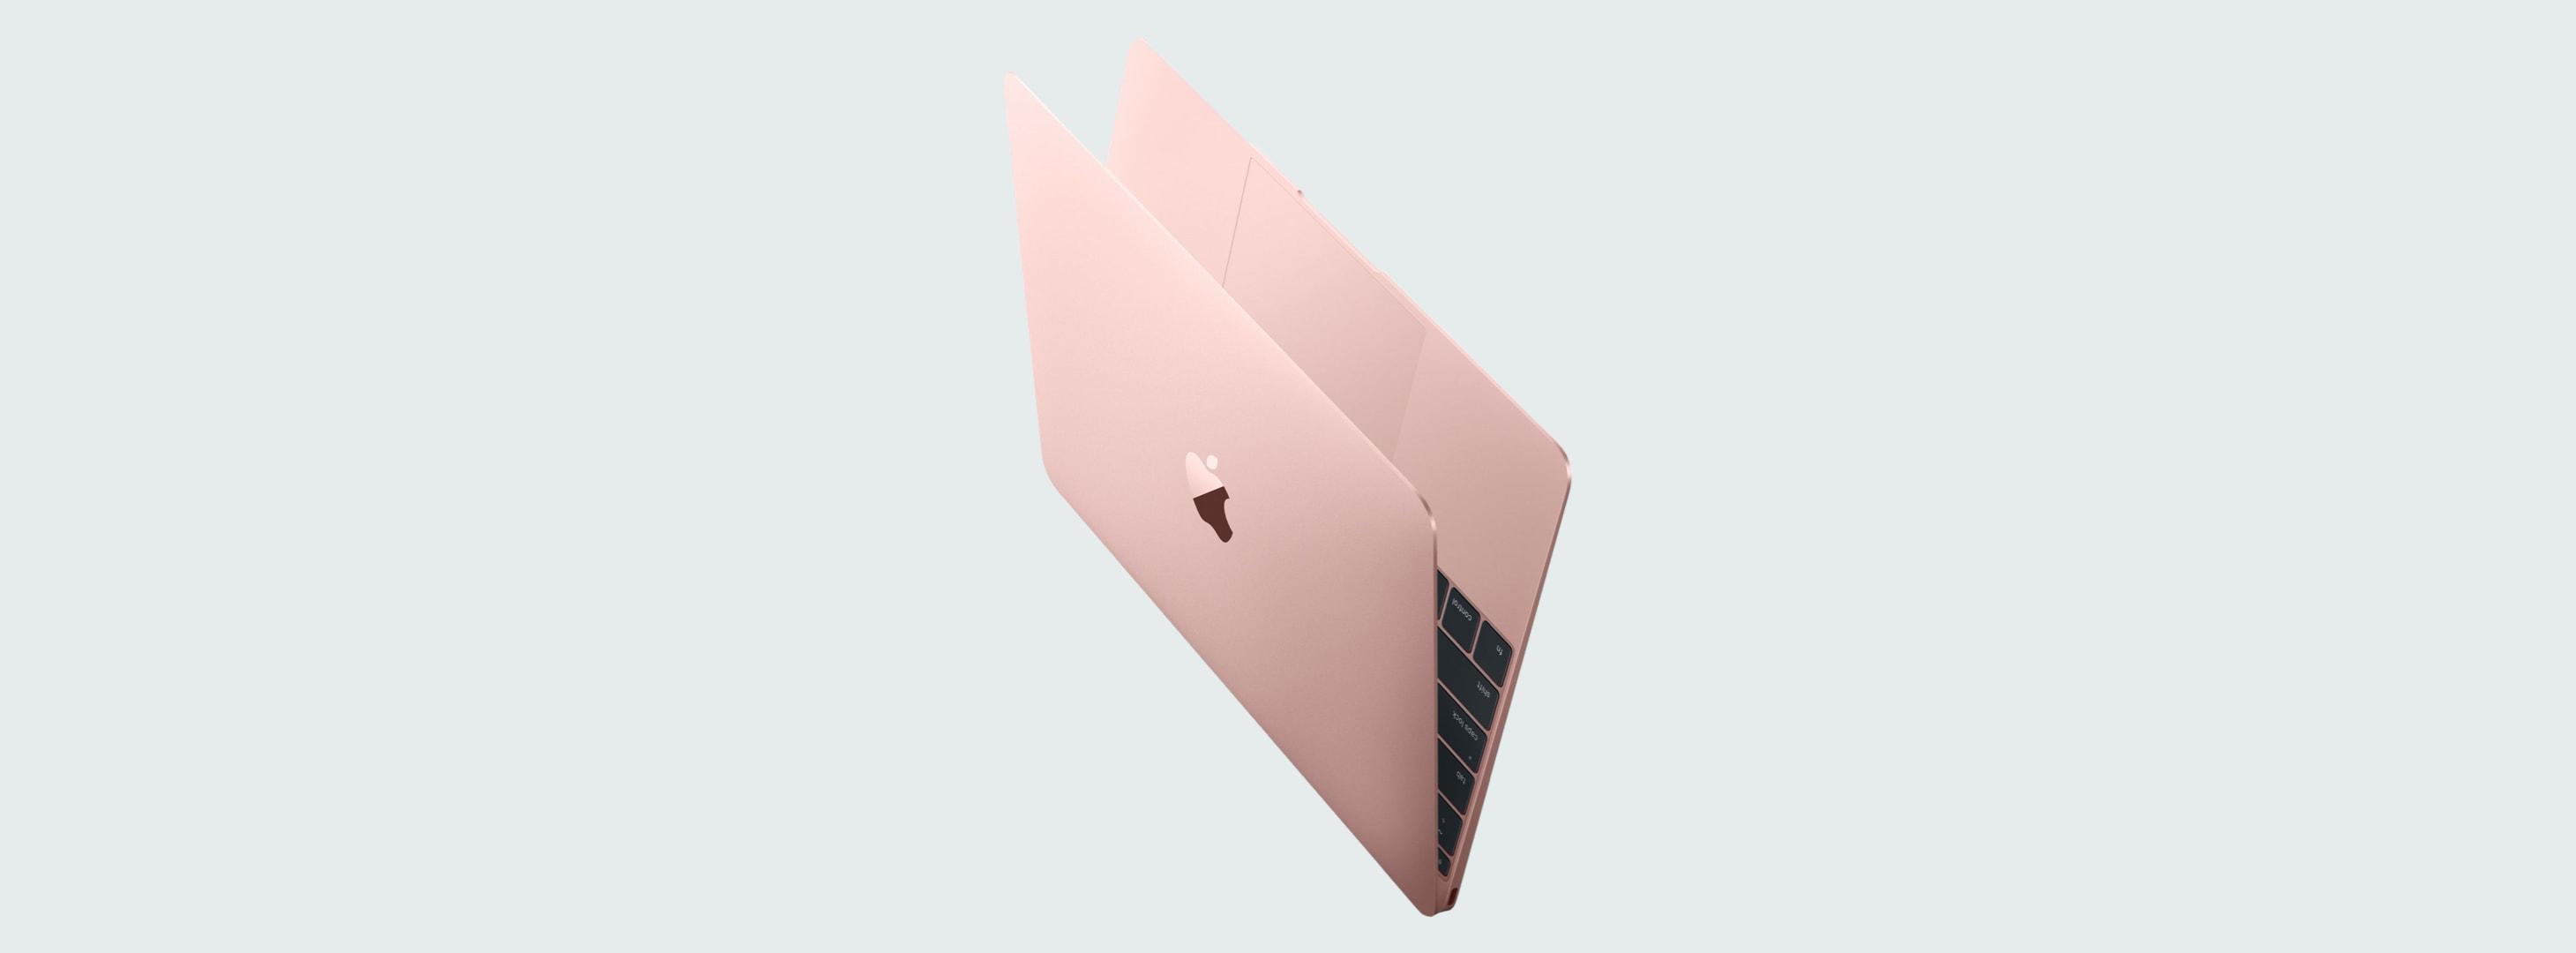 allapplenews_macos_macbook_air_product